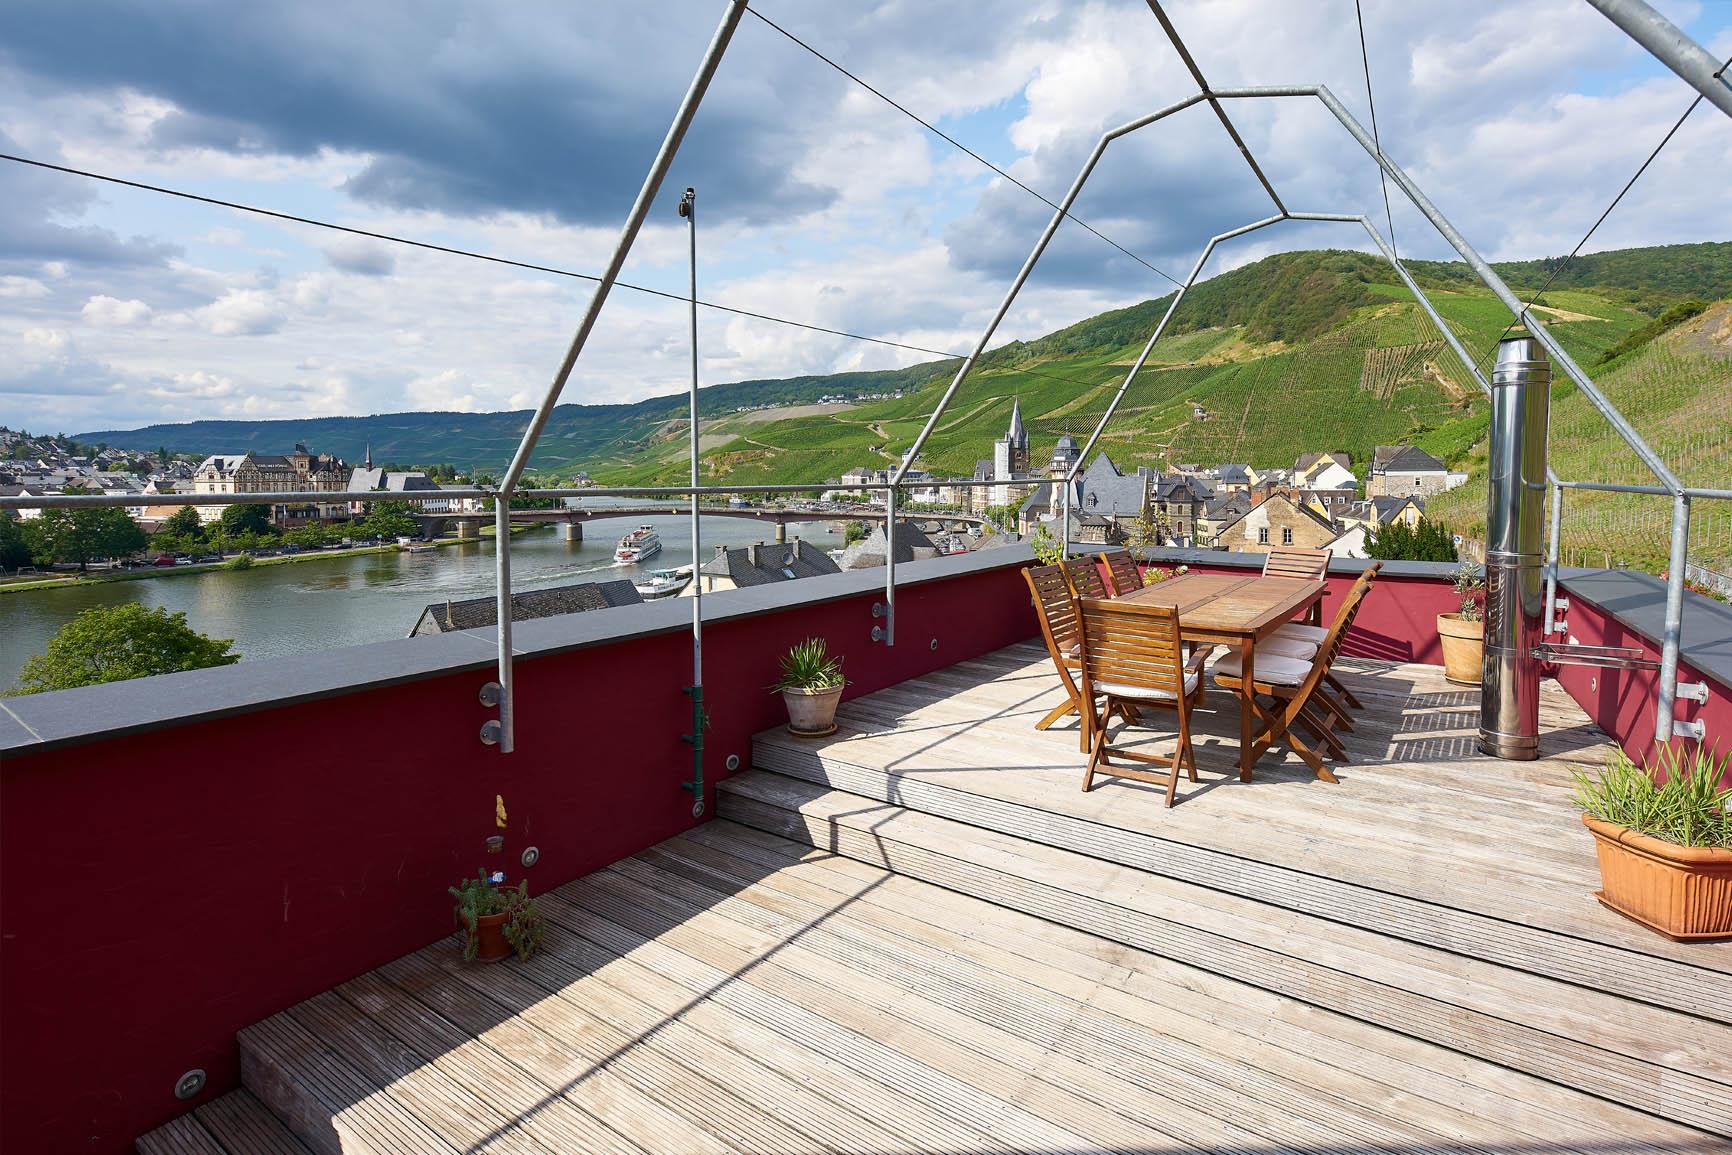 Ferienhaus Mosel-Herberge Terrasse mit Mosel-Panoramablick